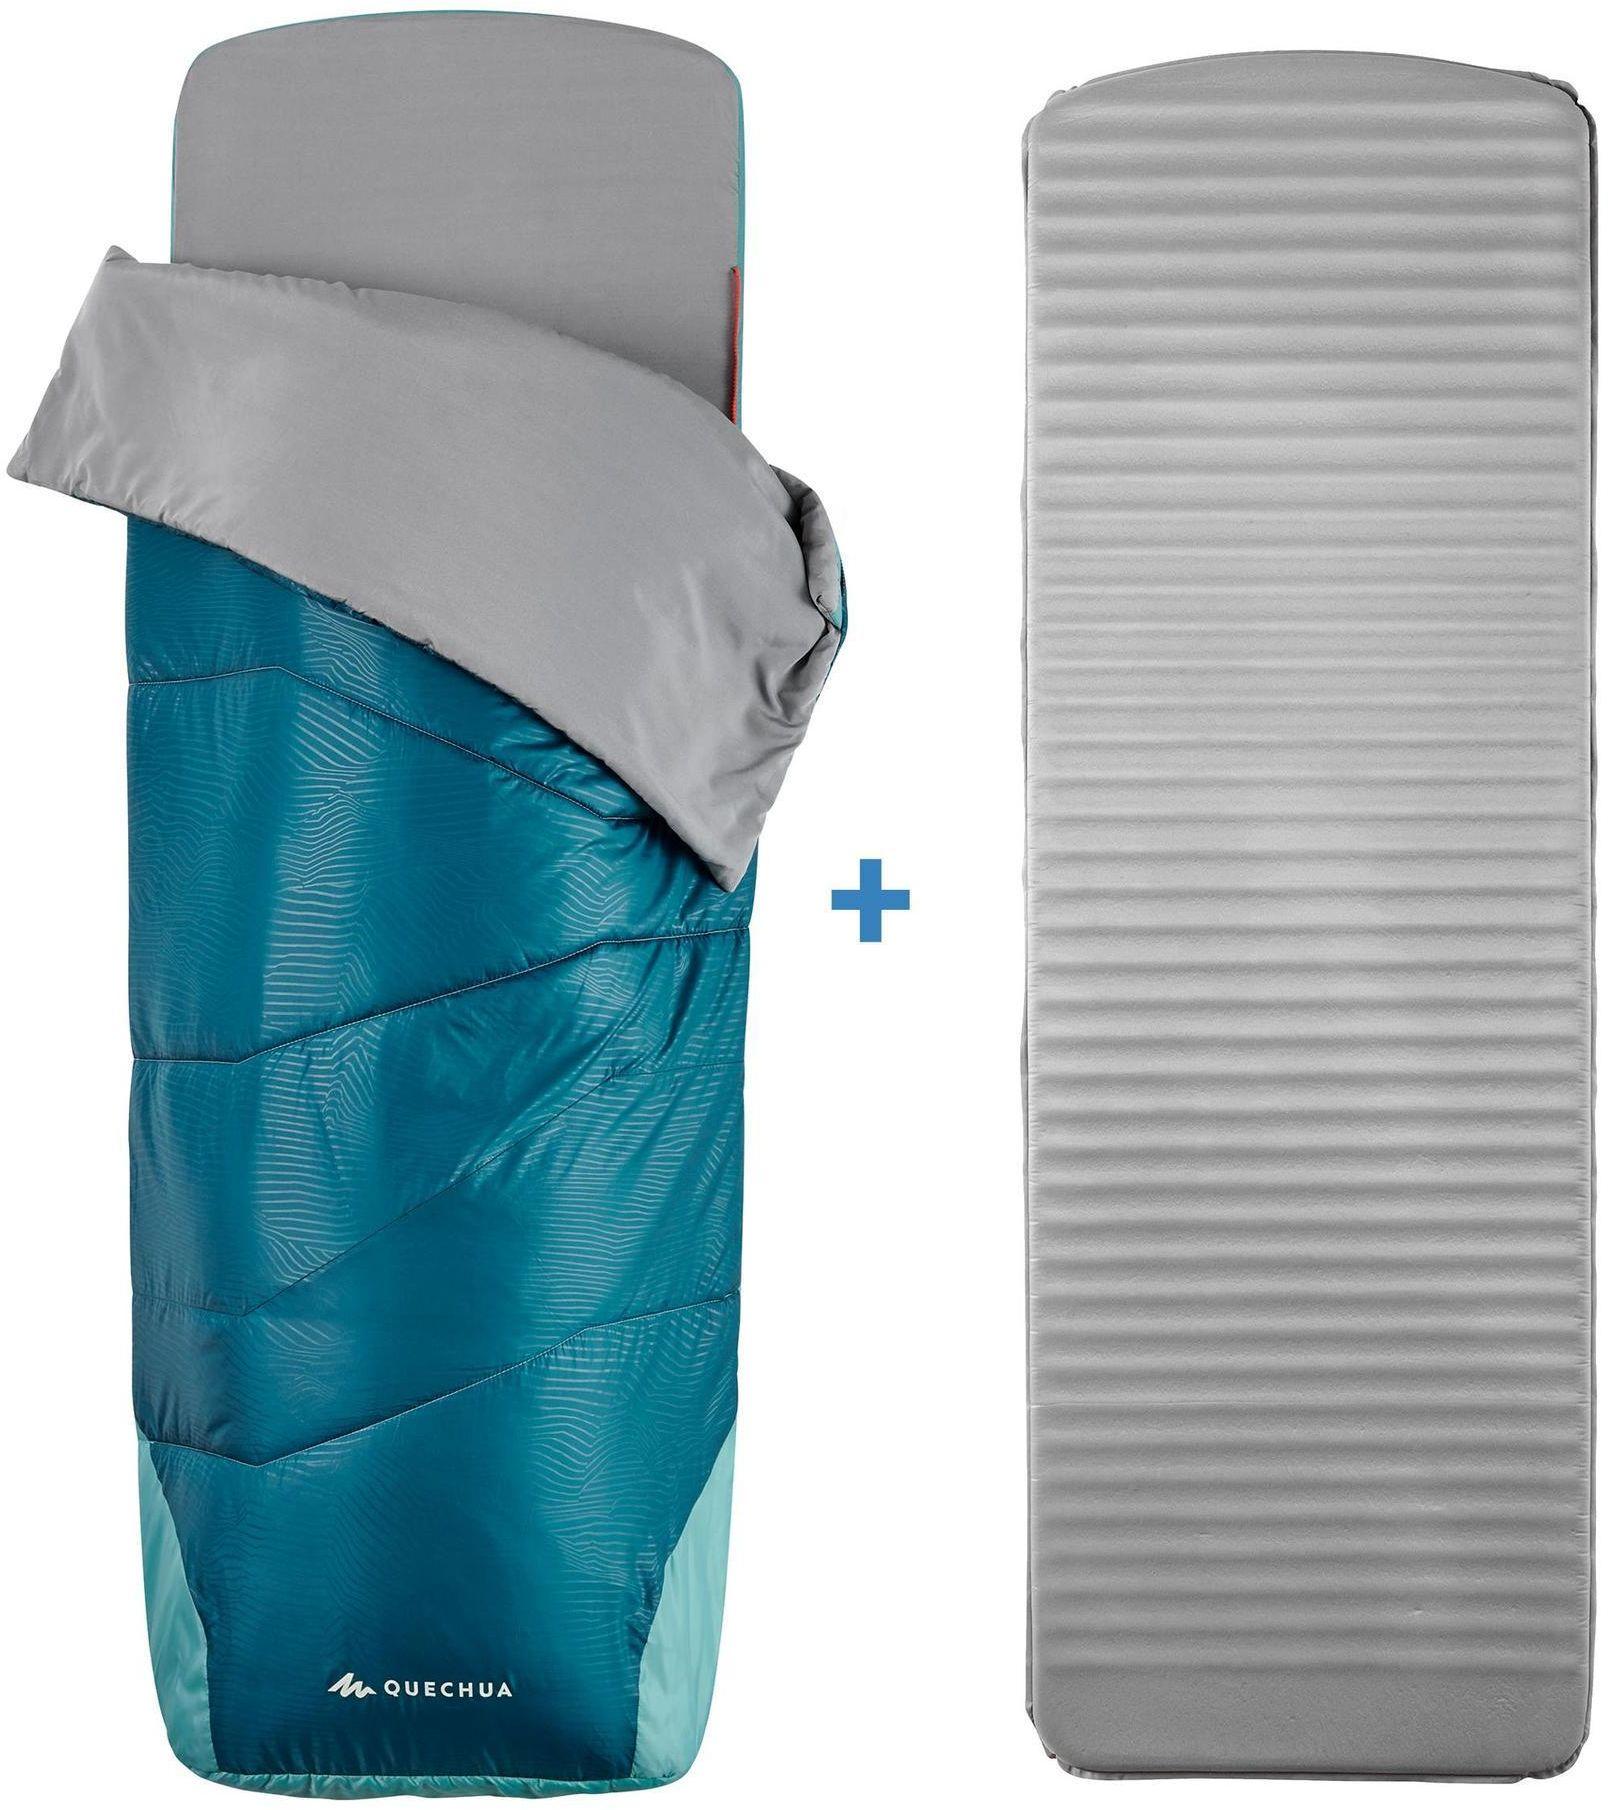 Śpiwór 2 w 1 - MH500 15 C L